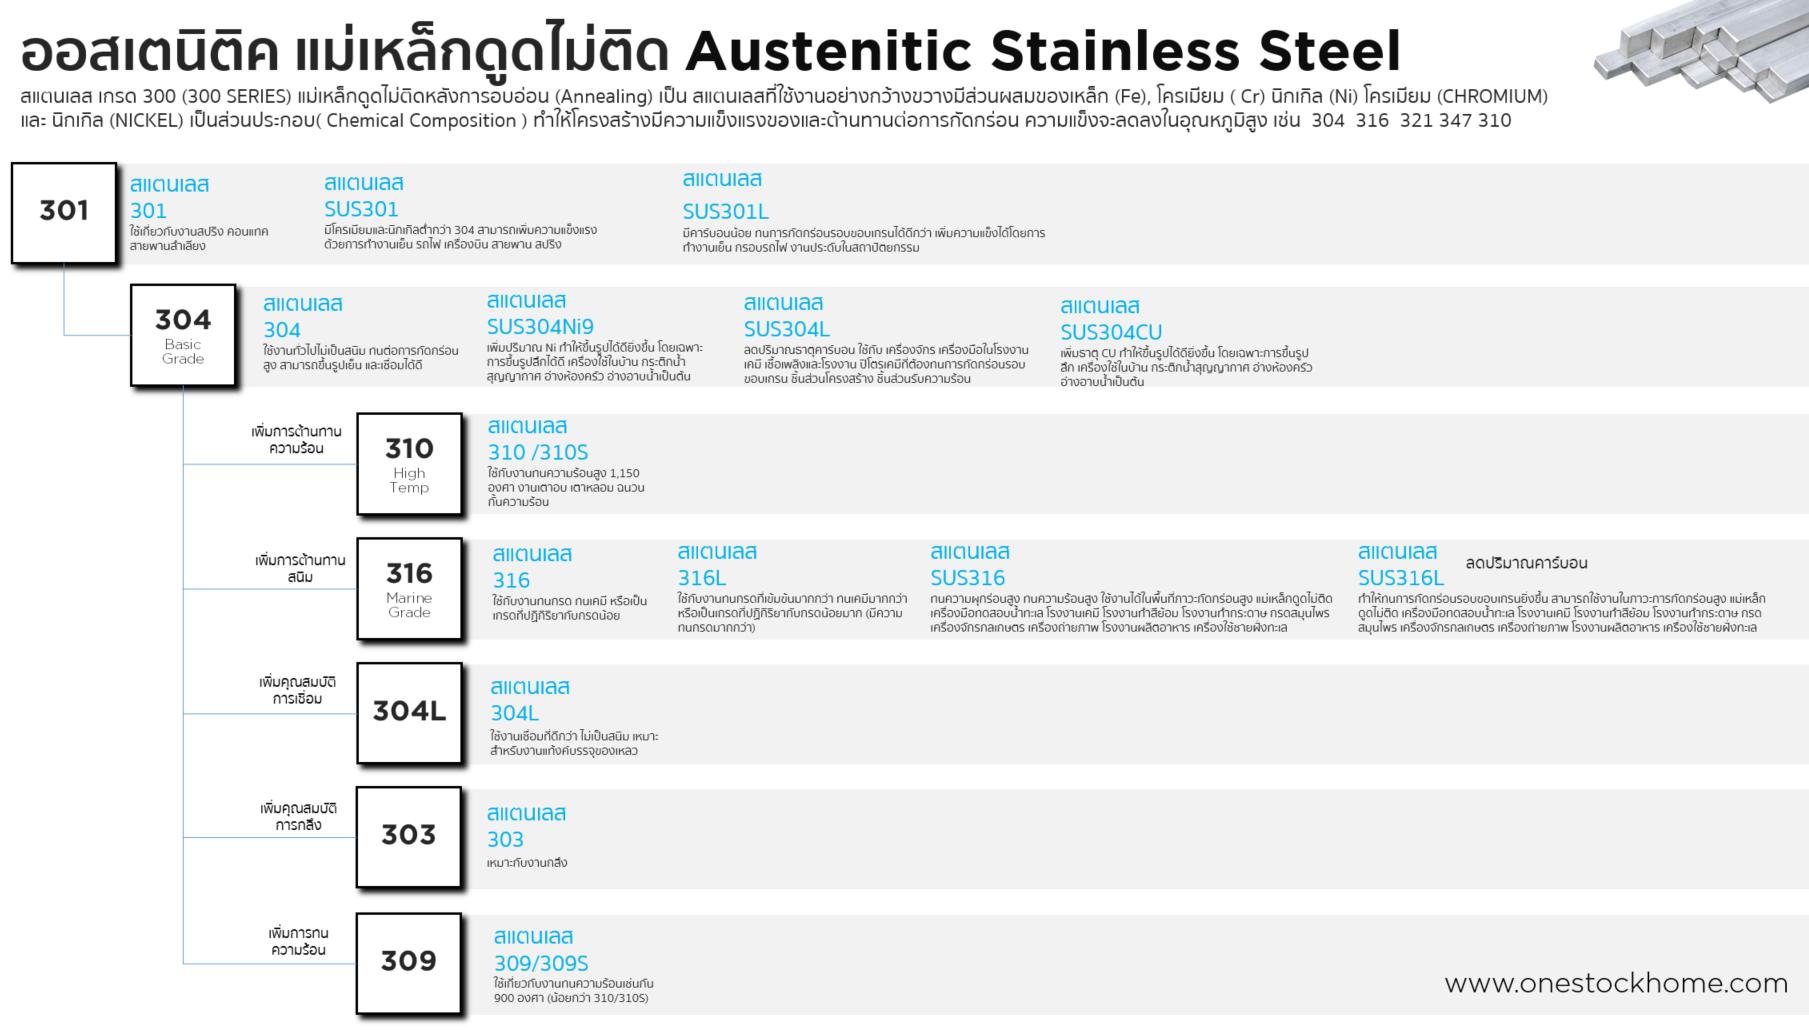 stainless,ประเภทเหล็ก,สแตนเลส,แผ่นสเตนเลส,สแตนเลส,แผ่น,304